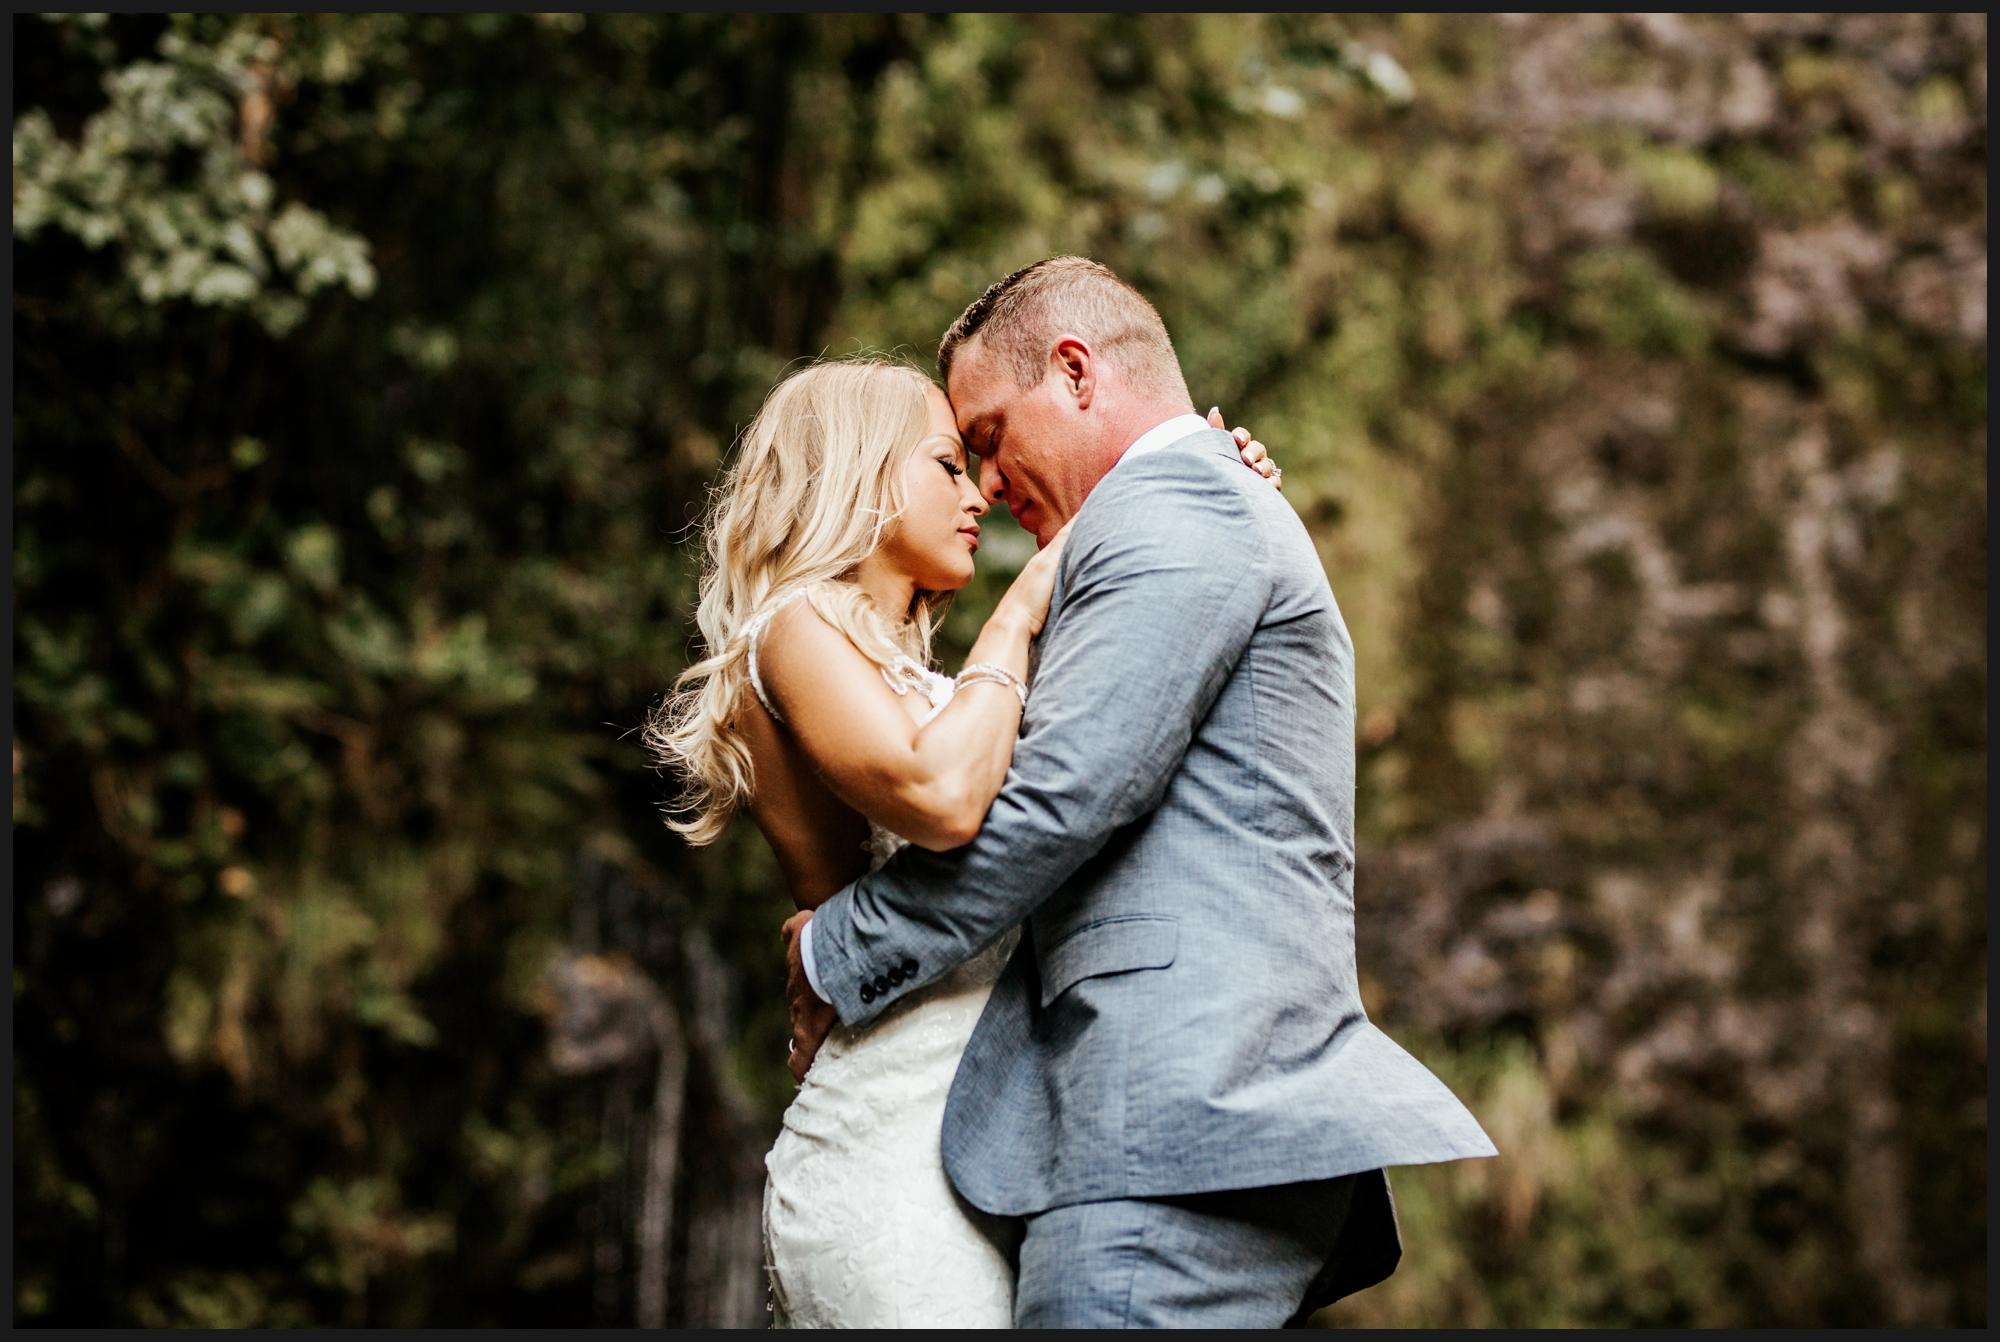 Orlando-Wedding-Photographer-destination-wedding-photographer-florida-wedding-photographer-hawaii-wedding-photographer_0021.jpg